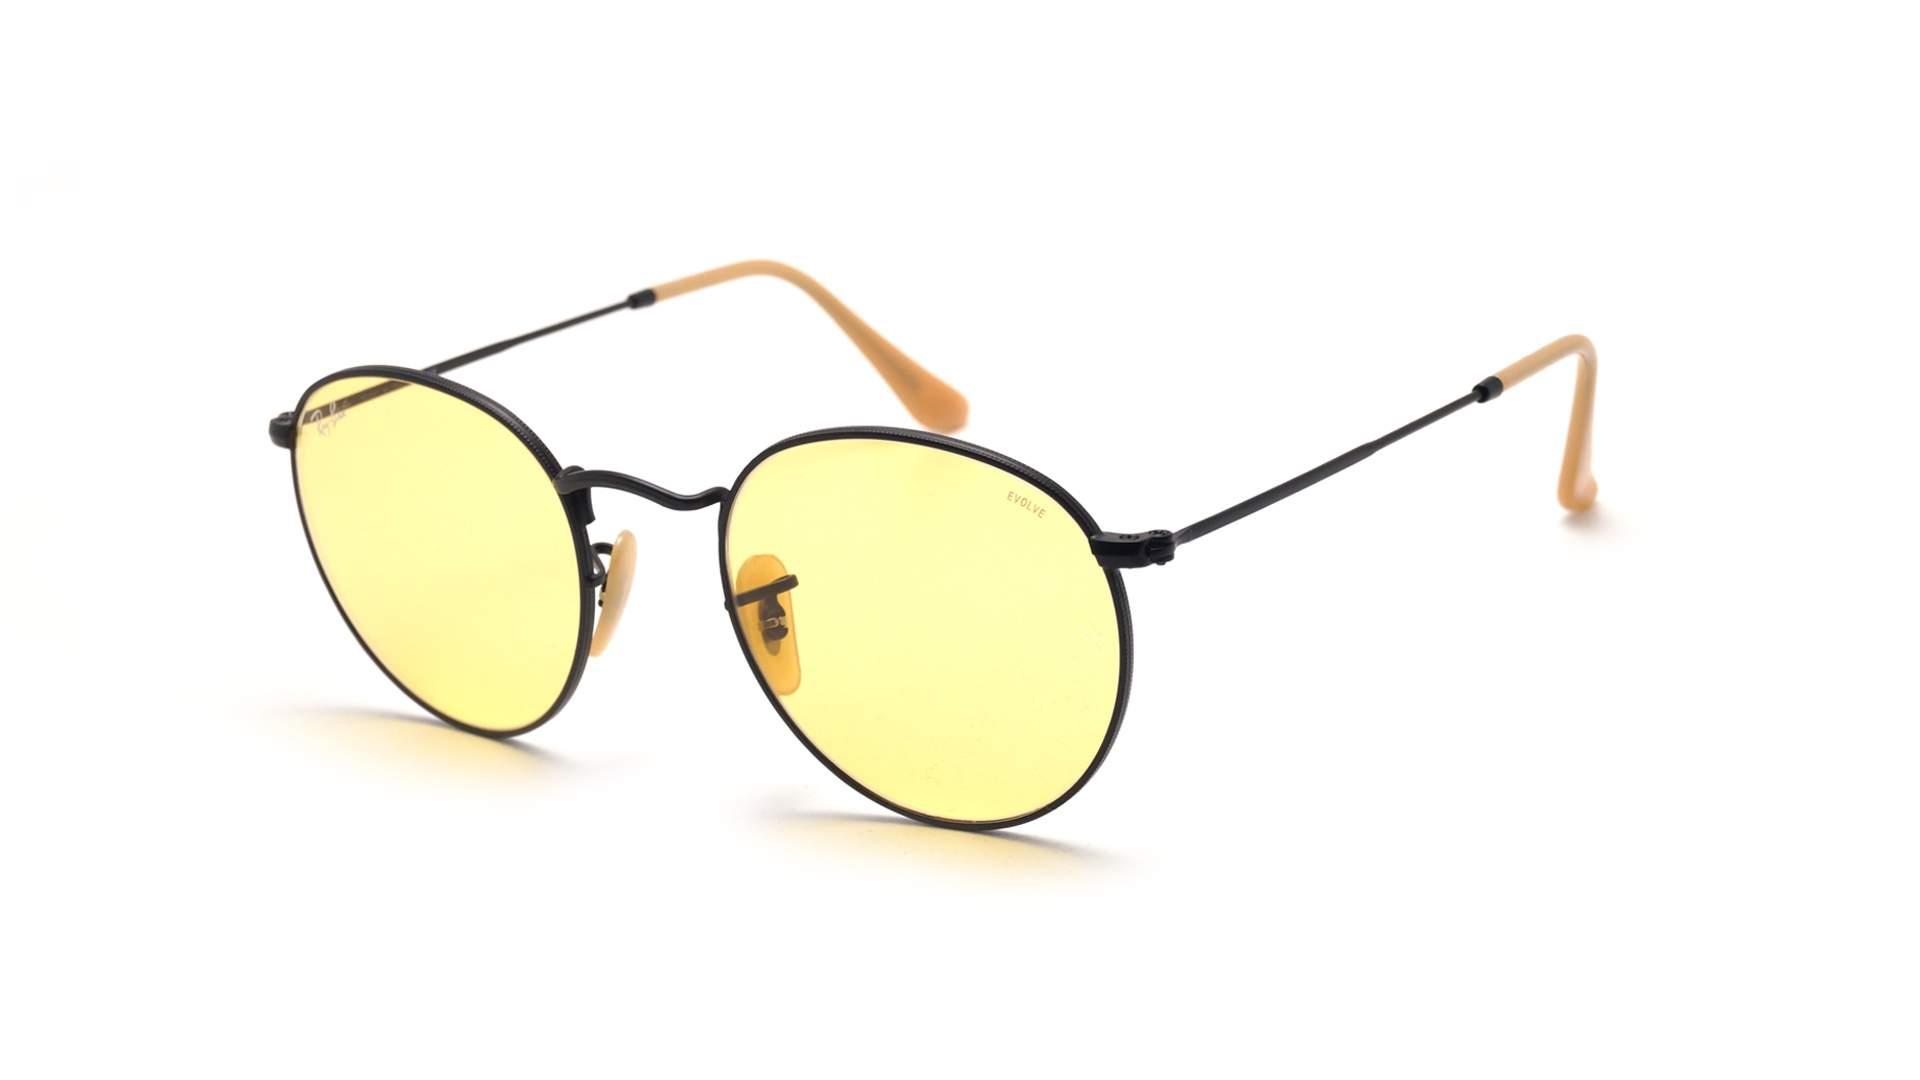 b3893cb4c2 ... new zealand sunglasses ray ban round evolve black matte rb3447 9066 4a  50 21 medium photochromic